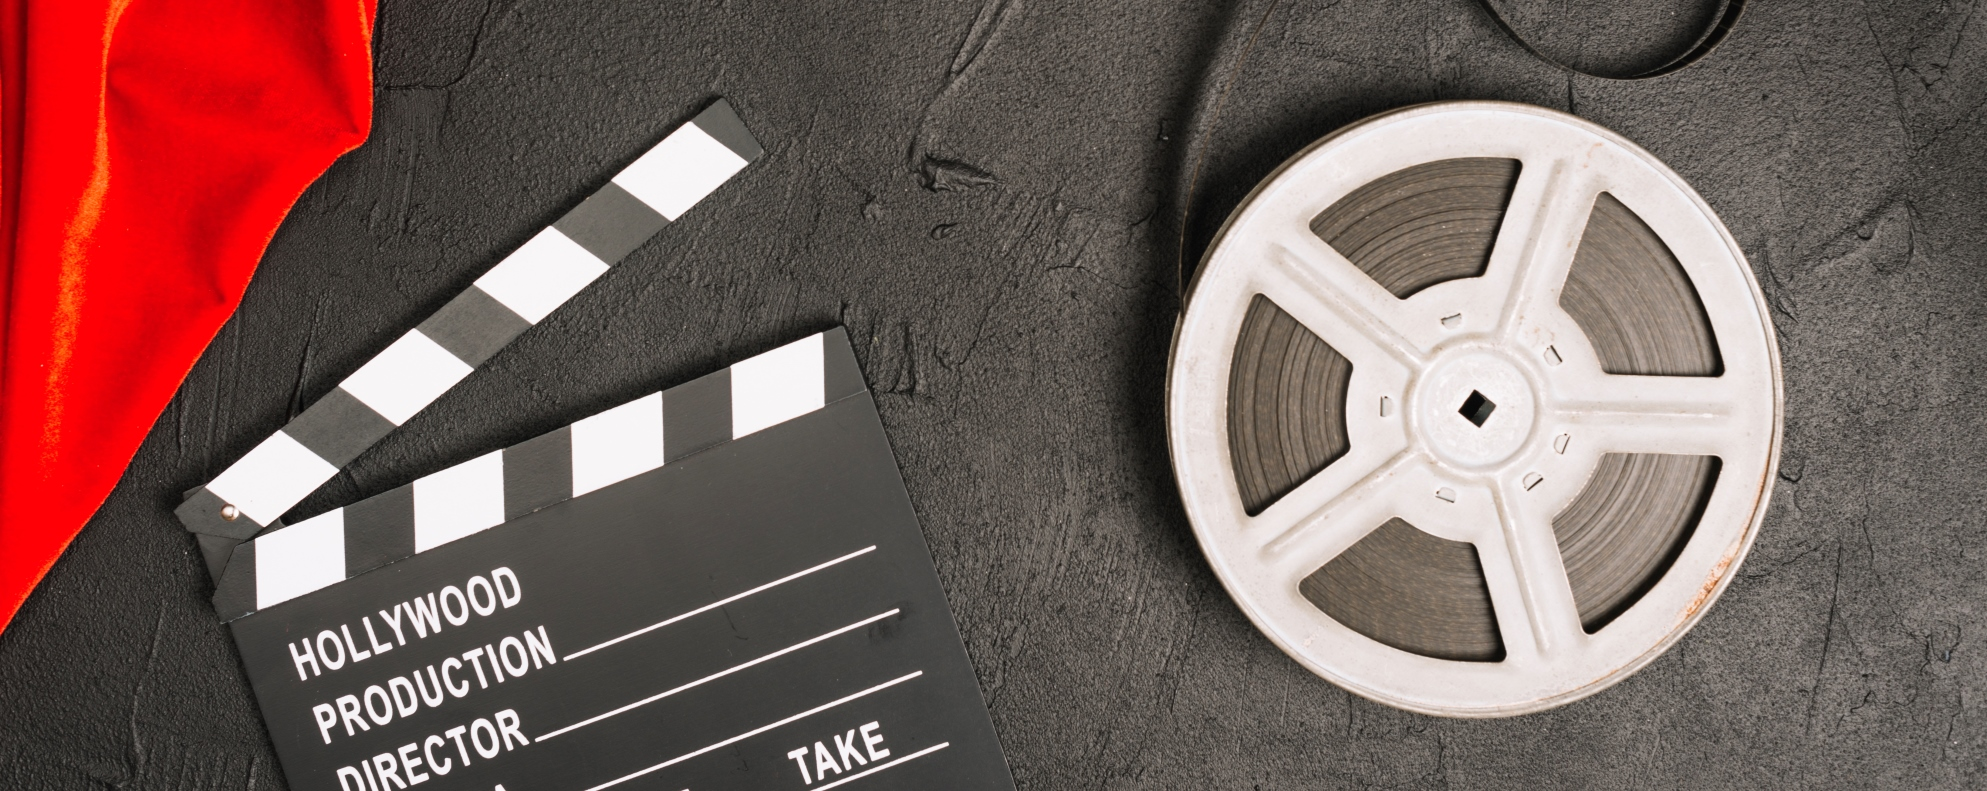 Online mesterkurzust indít Spike Lee filmrendező